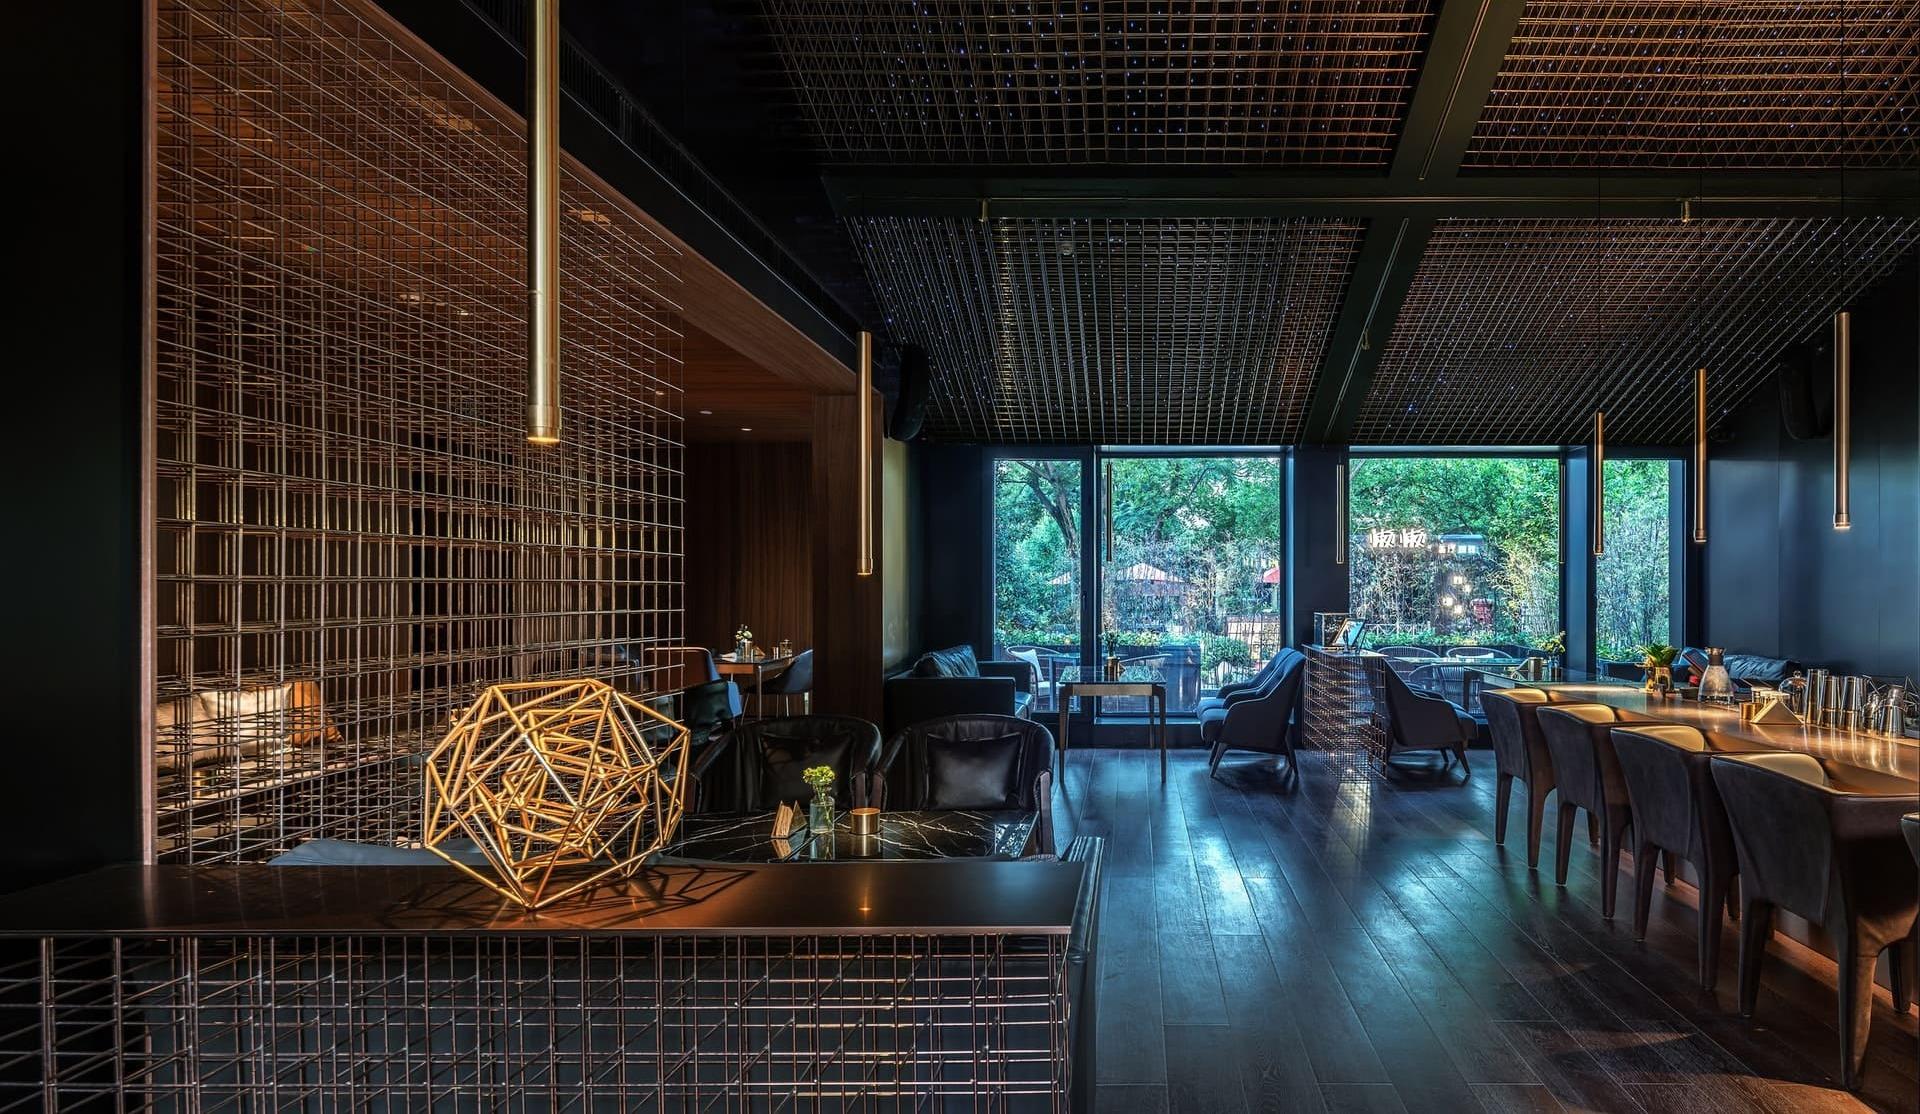 Restaurant Design - Innenarchitektur